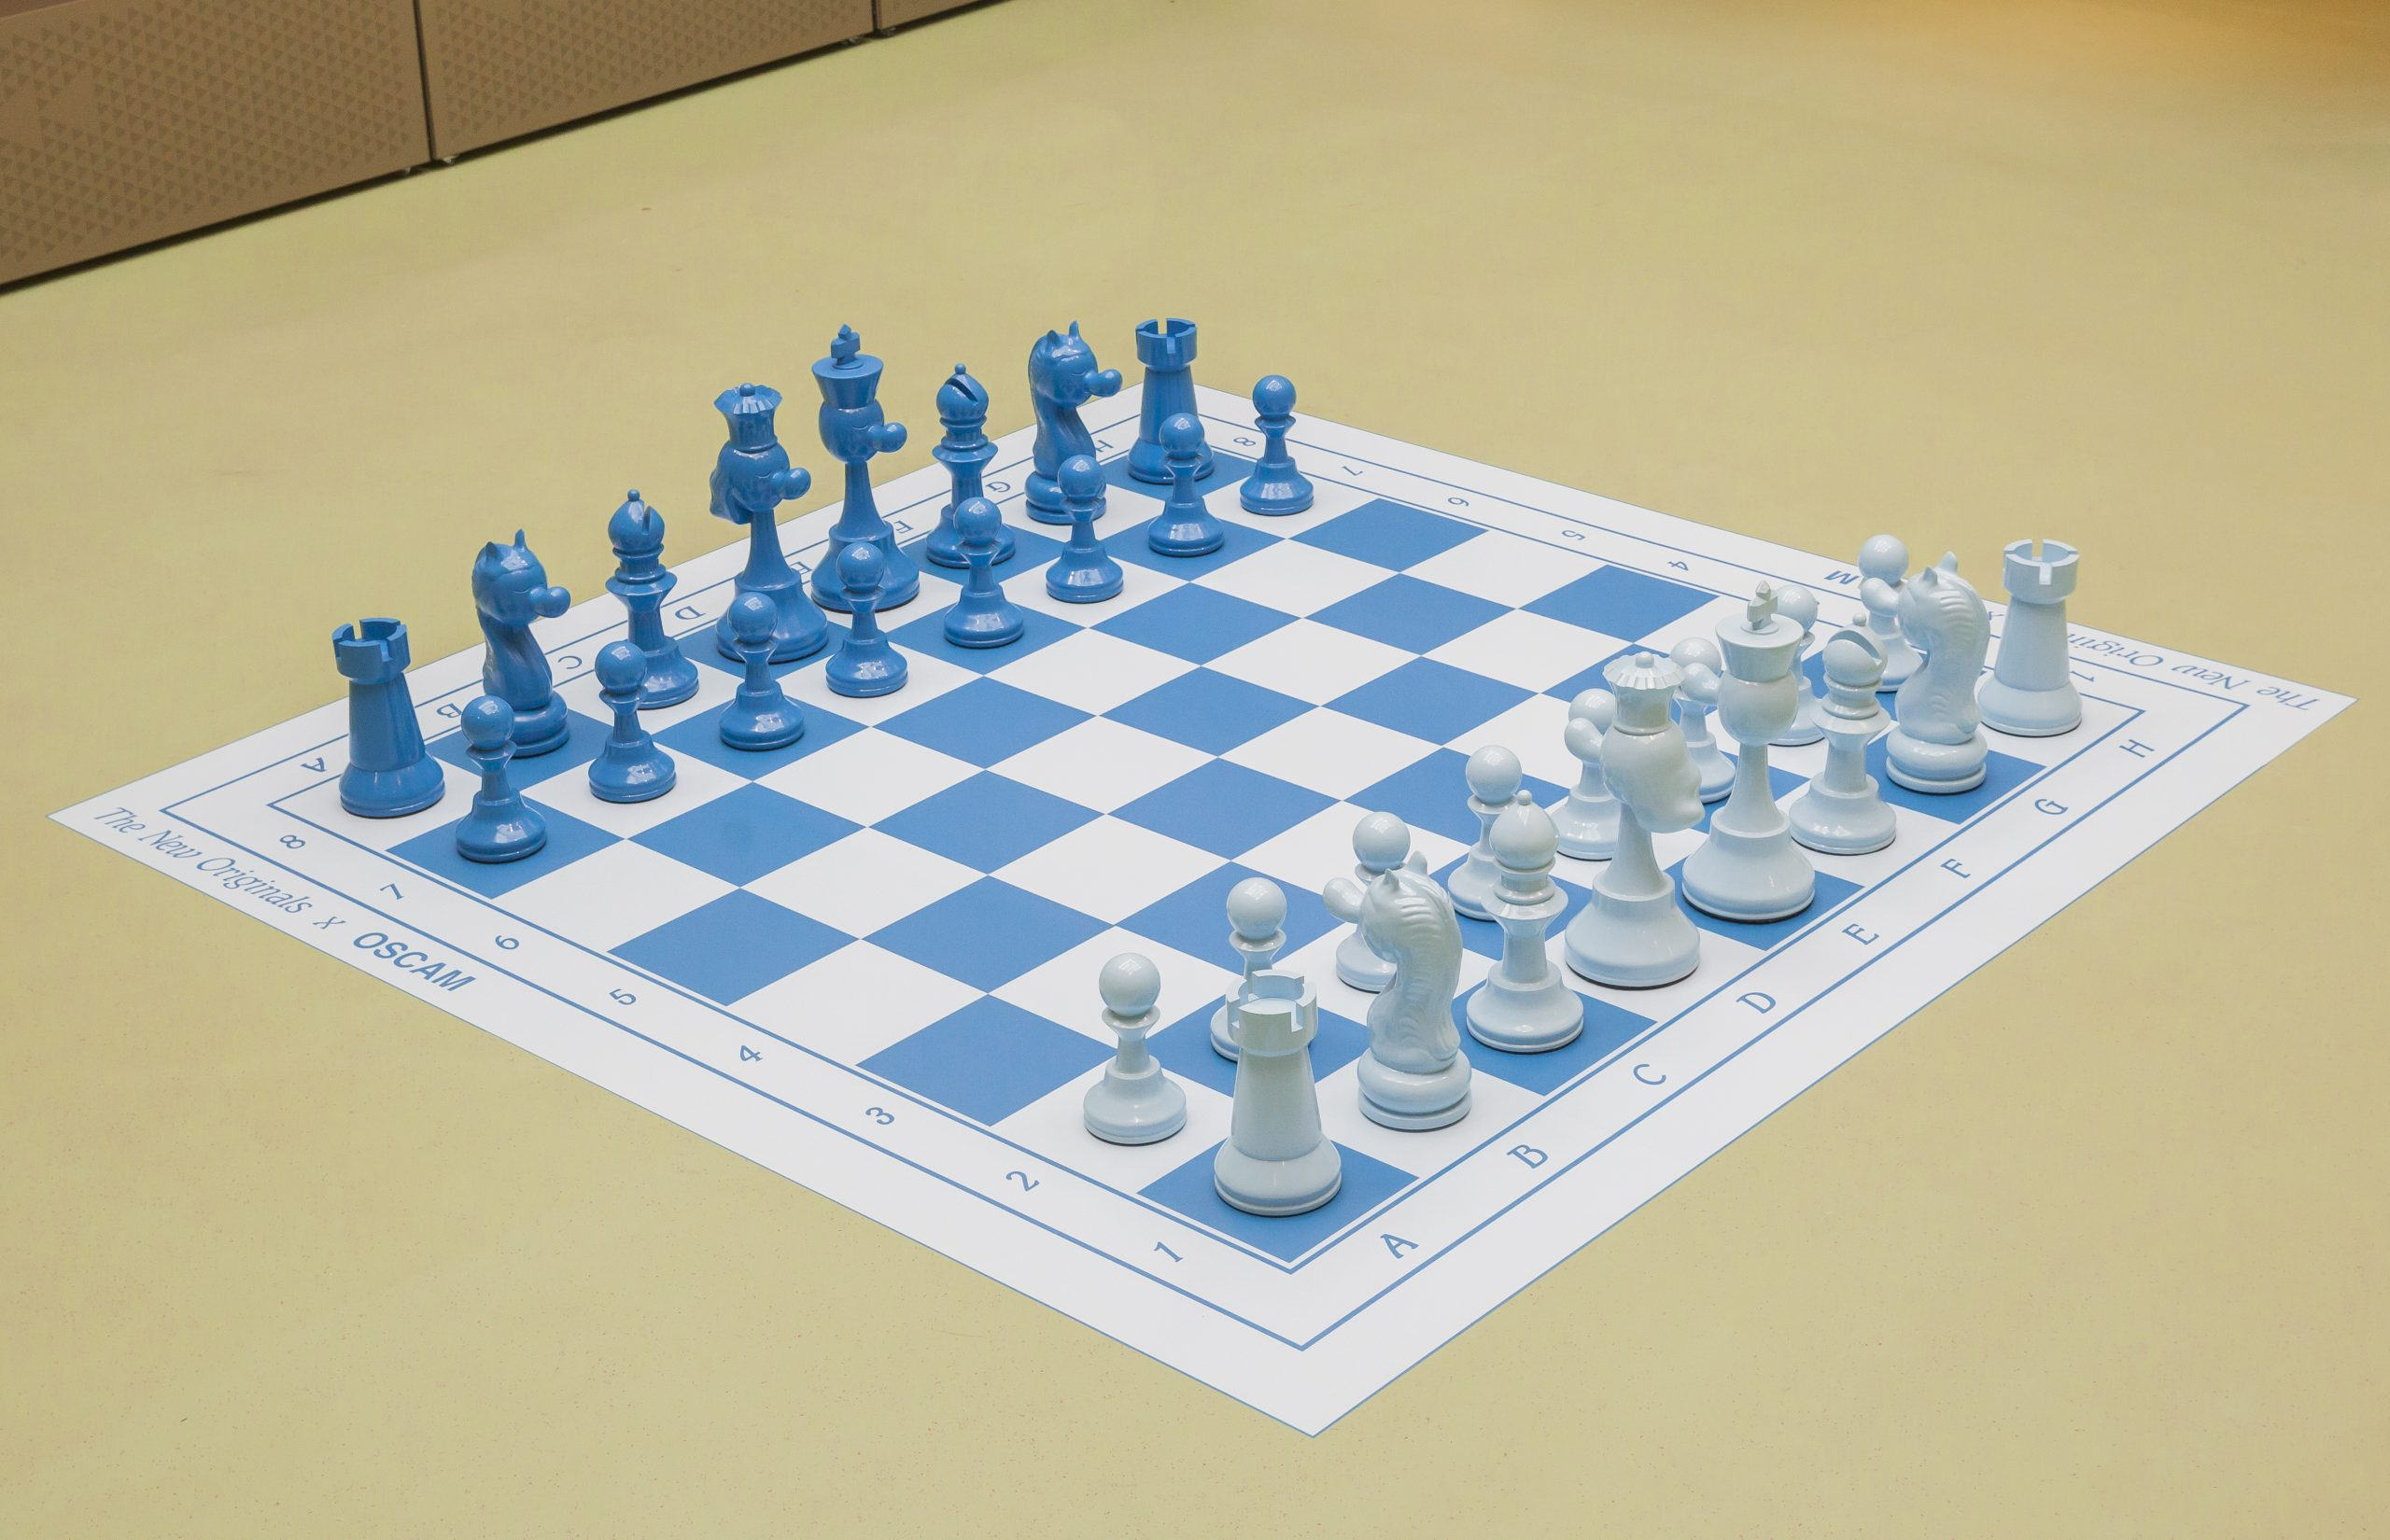 OSCAM x Freddy's Chess Mates